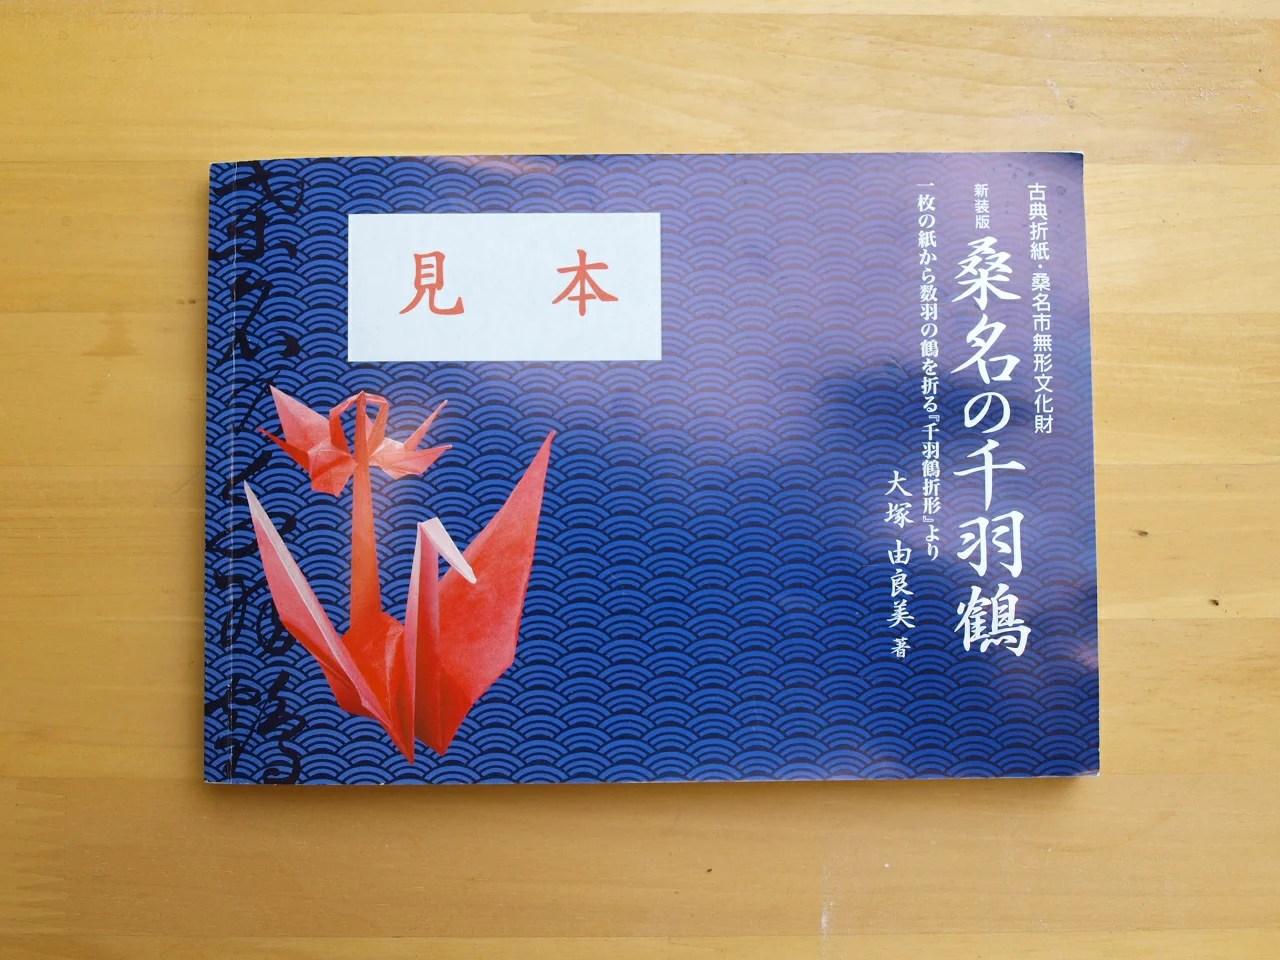 Isekuwana Muramasa knife shop   樂天海外銷售: 桑名起重機大塚由良美寫的折疊紙教材。